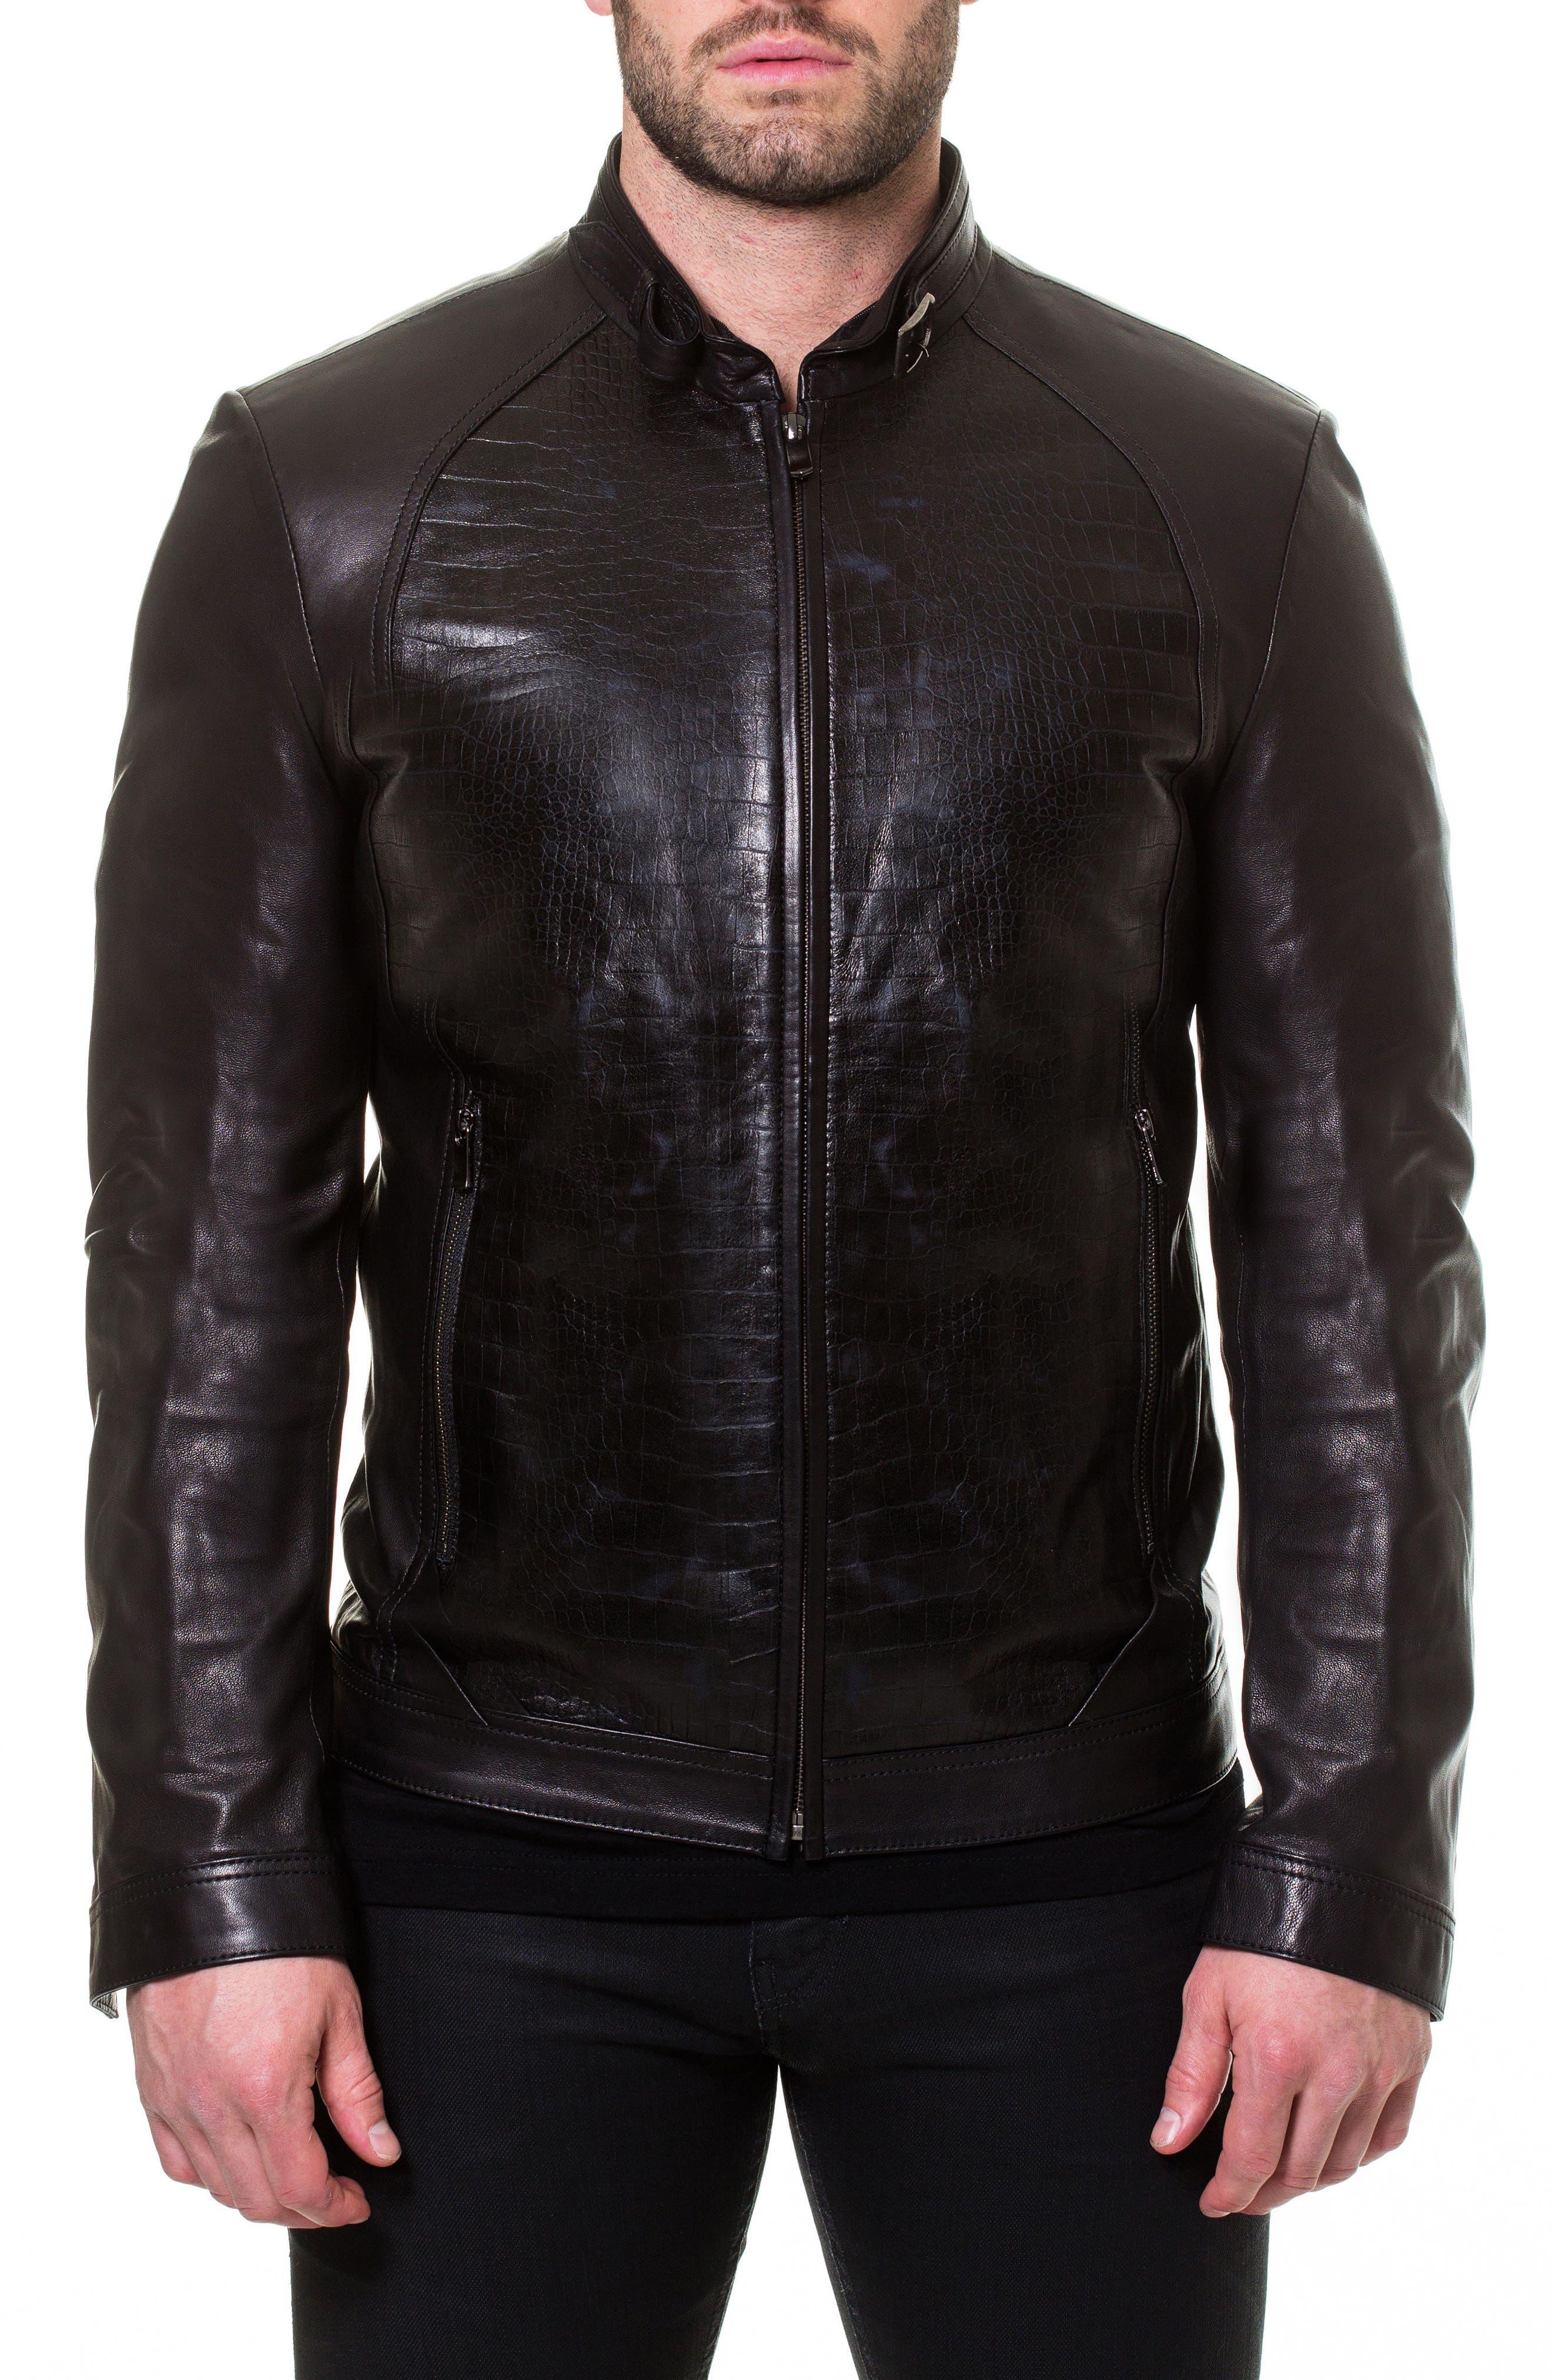 Tron Print Leather Jacket,                             Main thumbnail 1, color,                             Black